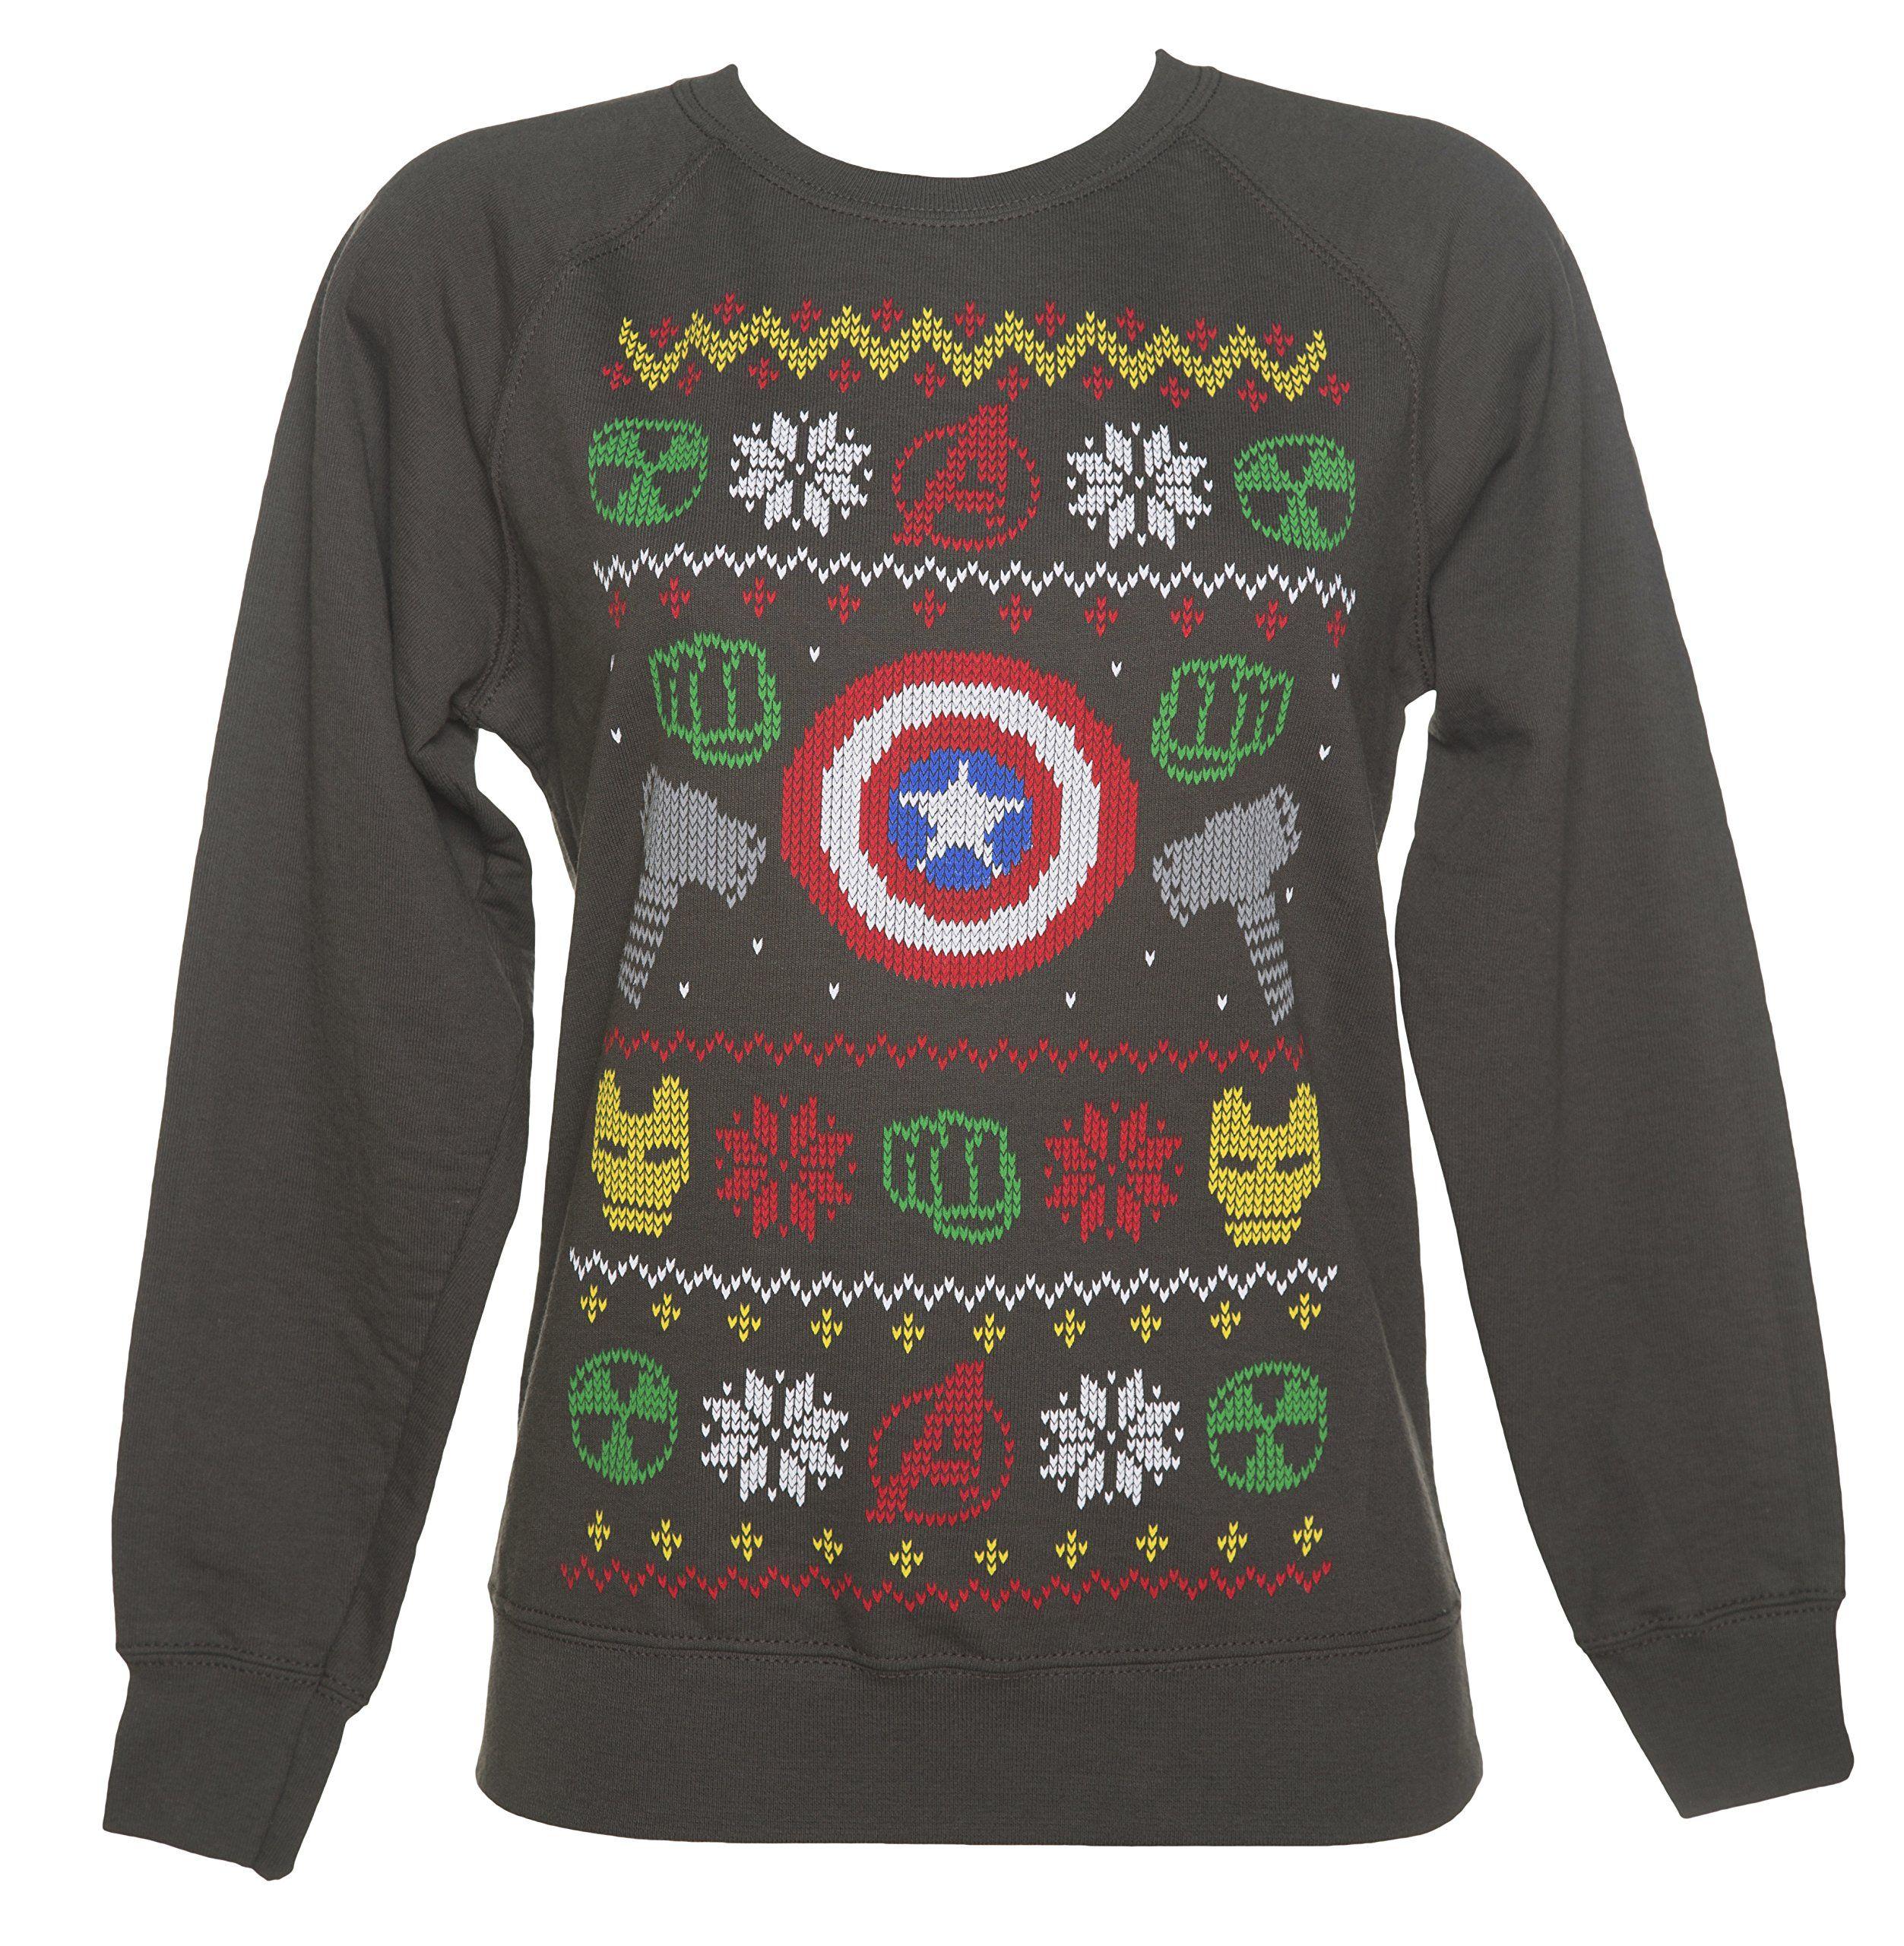 Marvel Superhero Symbols Ugly Christmas Sweater | The Best Ugly ...